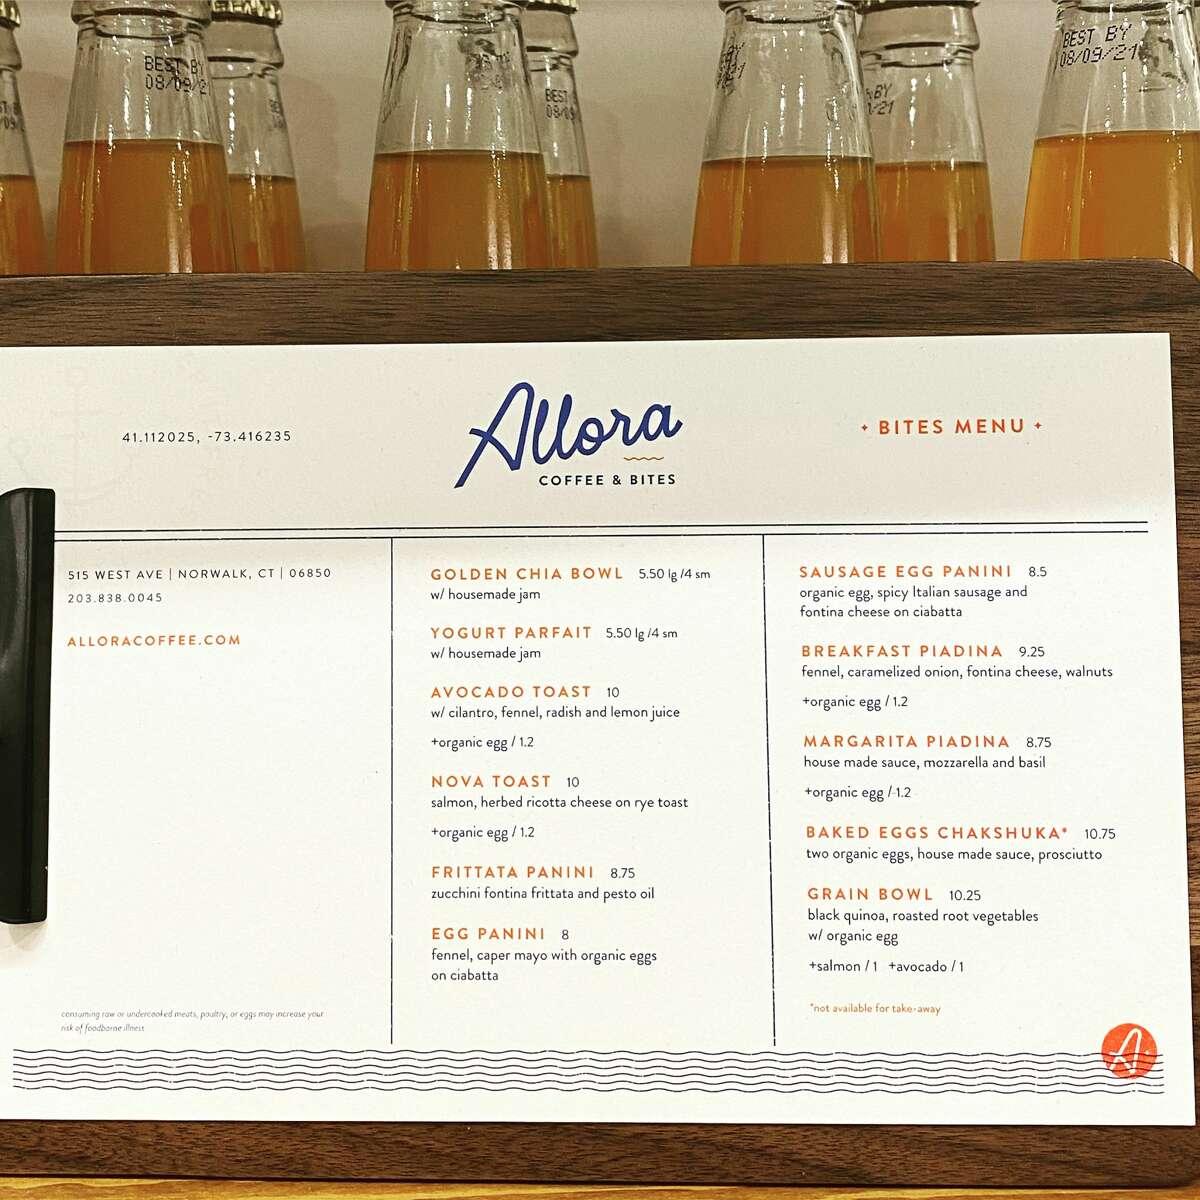 Allora's menu